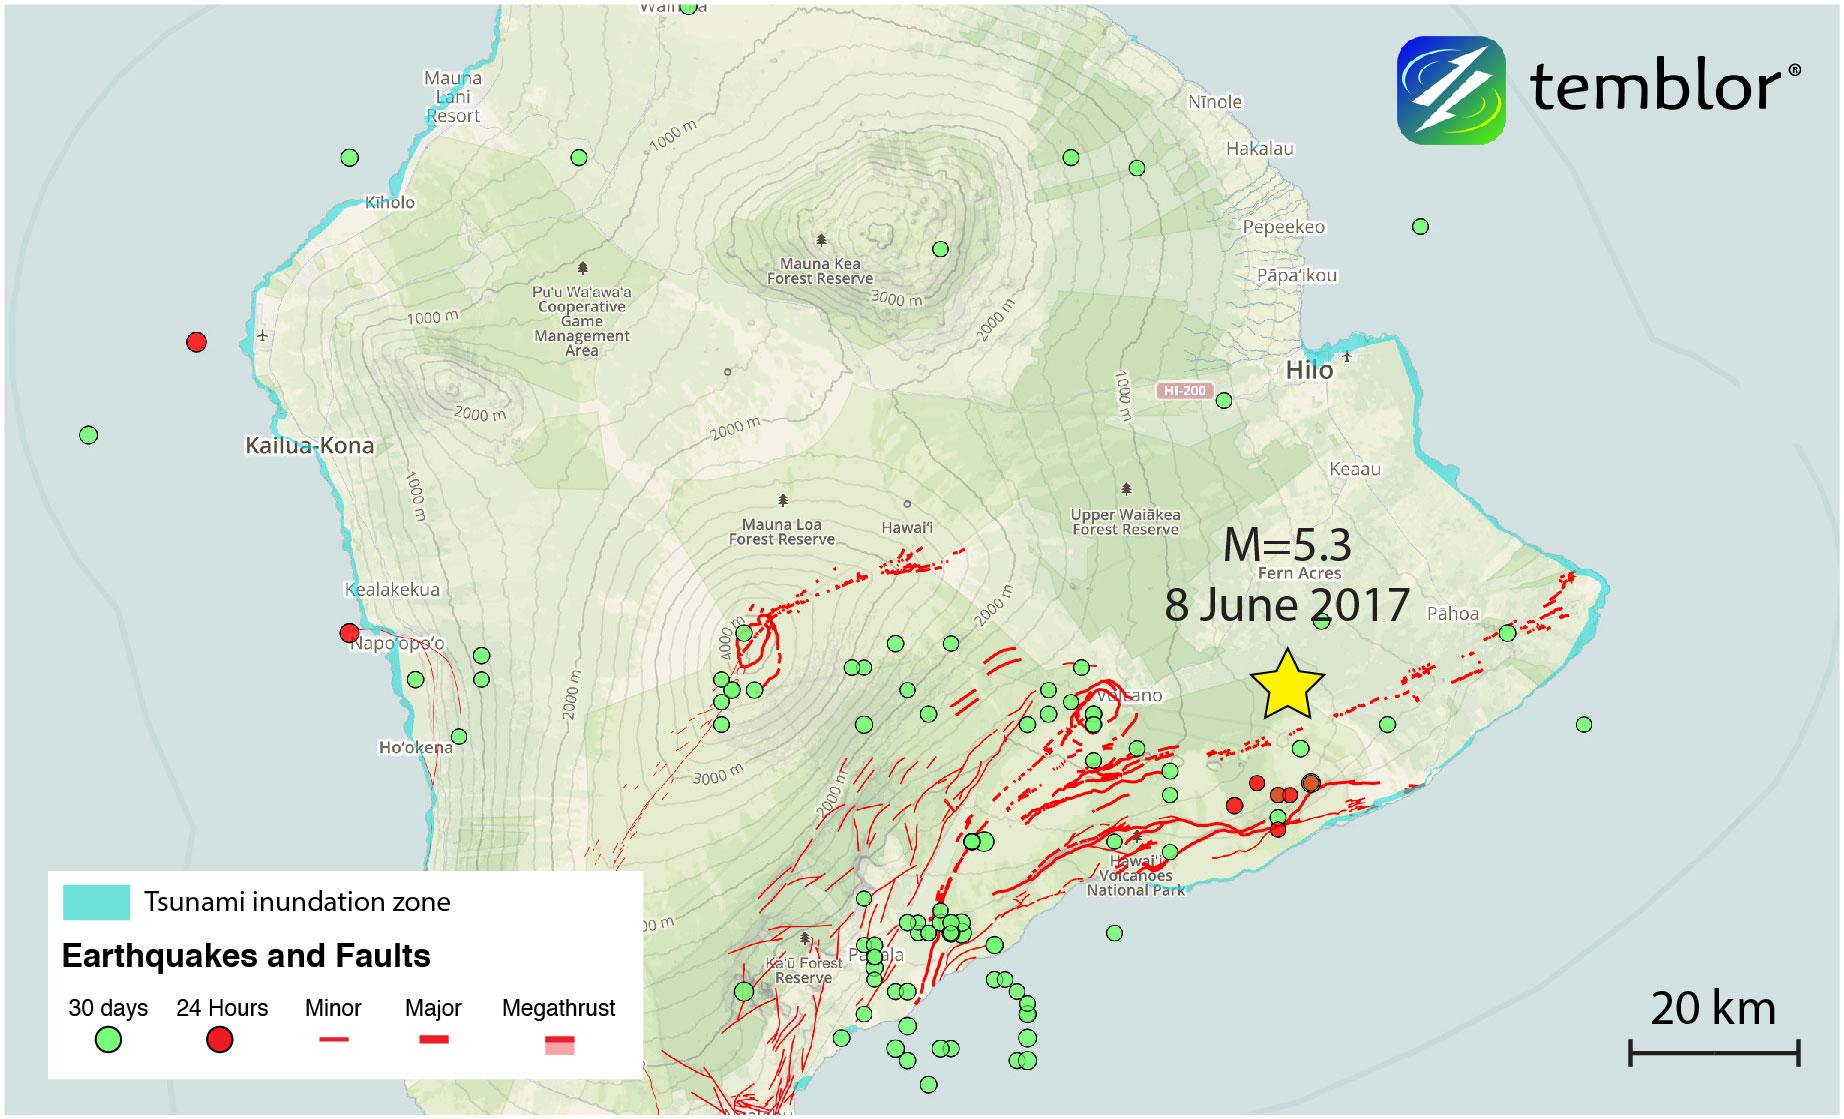 Aug 24, 2021· scientists detect earthquake swarm at hawaii volcano more this aug. M=5.3 earthquake shakes Hawaii's Big Island - Temblor.net